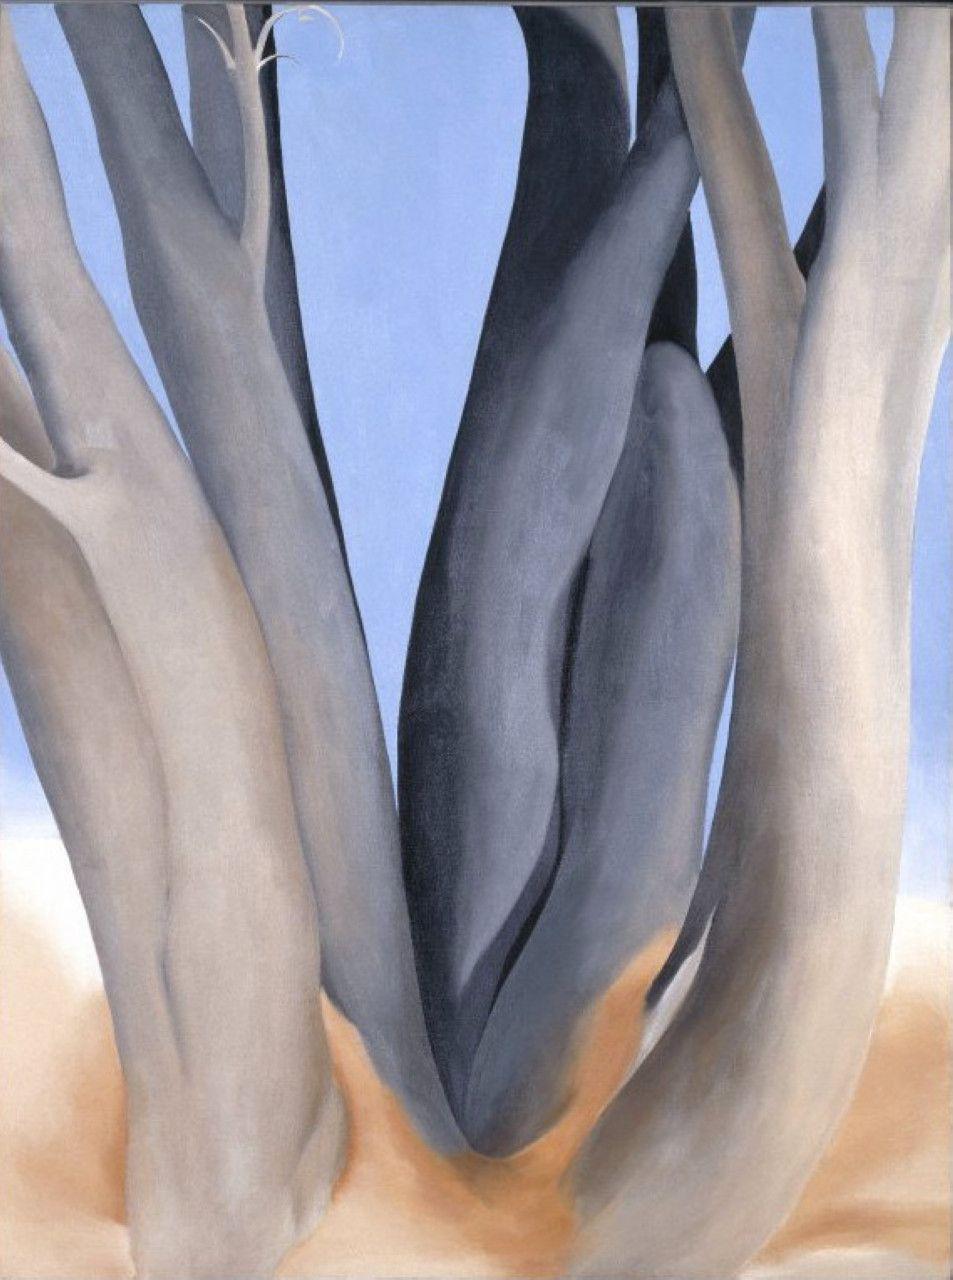 Dark tree trunks okeeffe art o